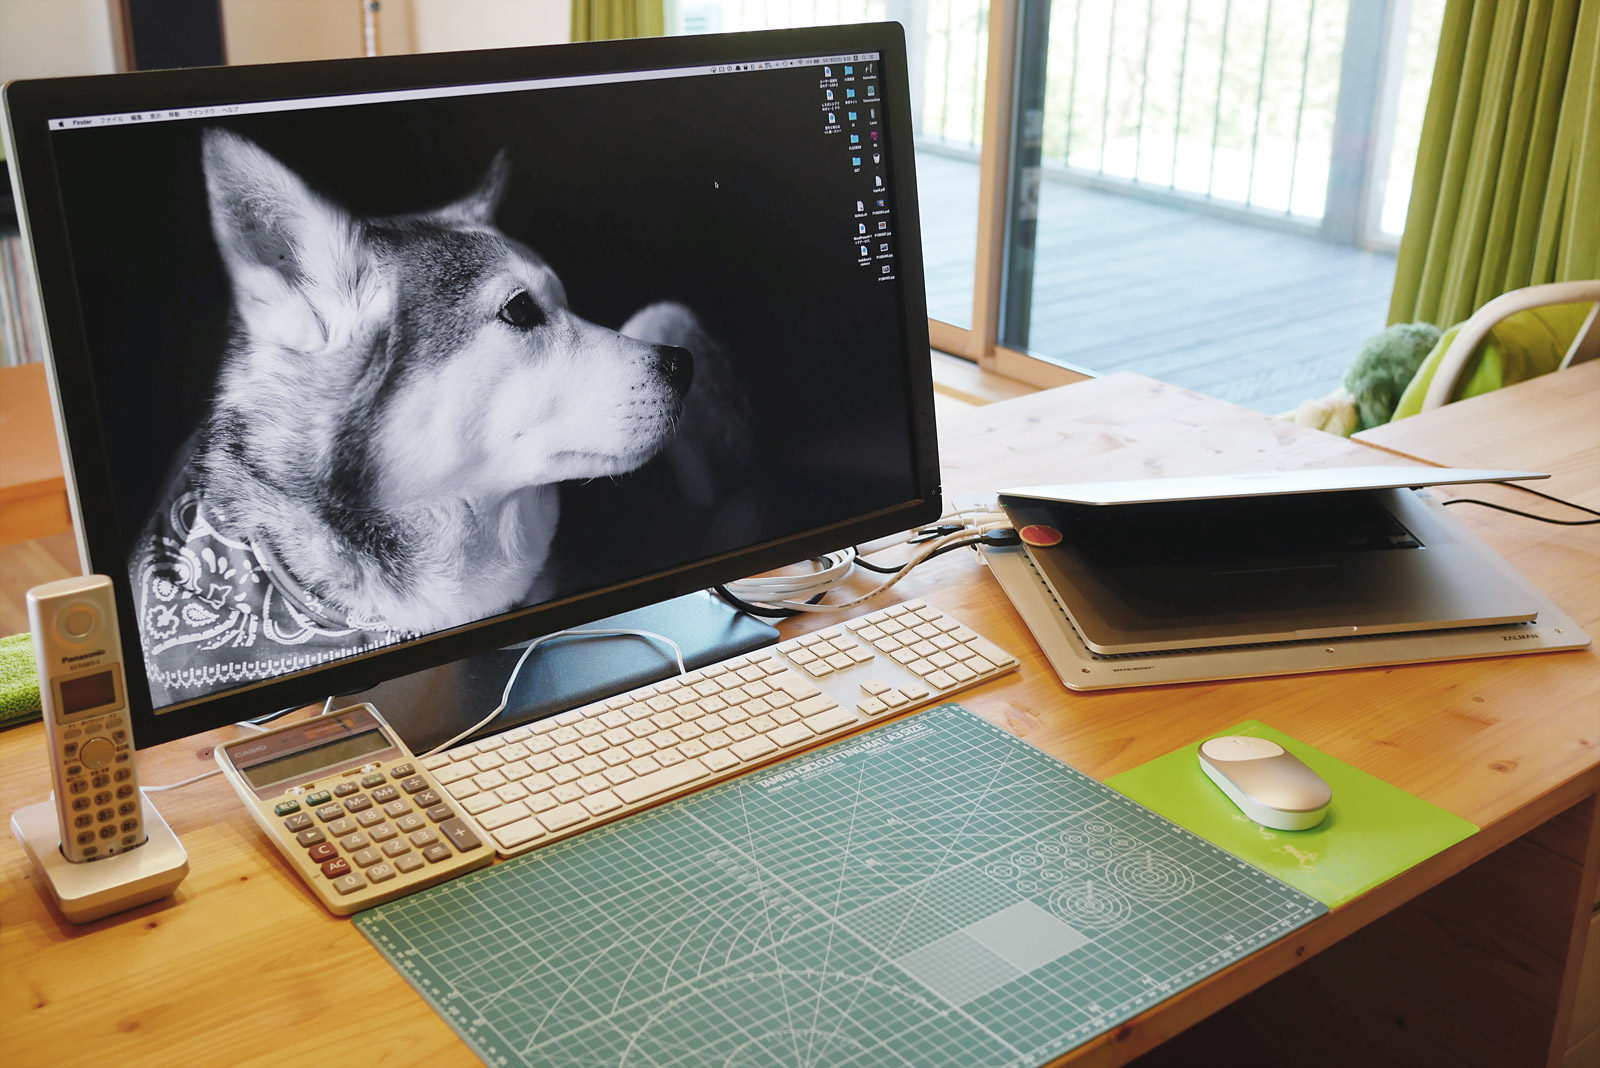 Macbook pro (late2013) バッテリー膨張